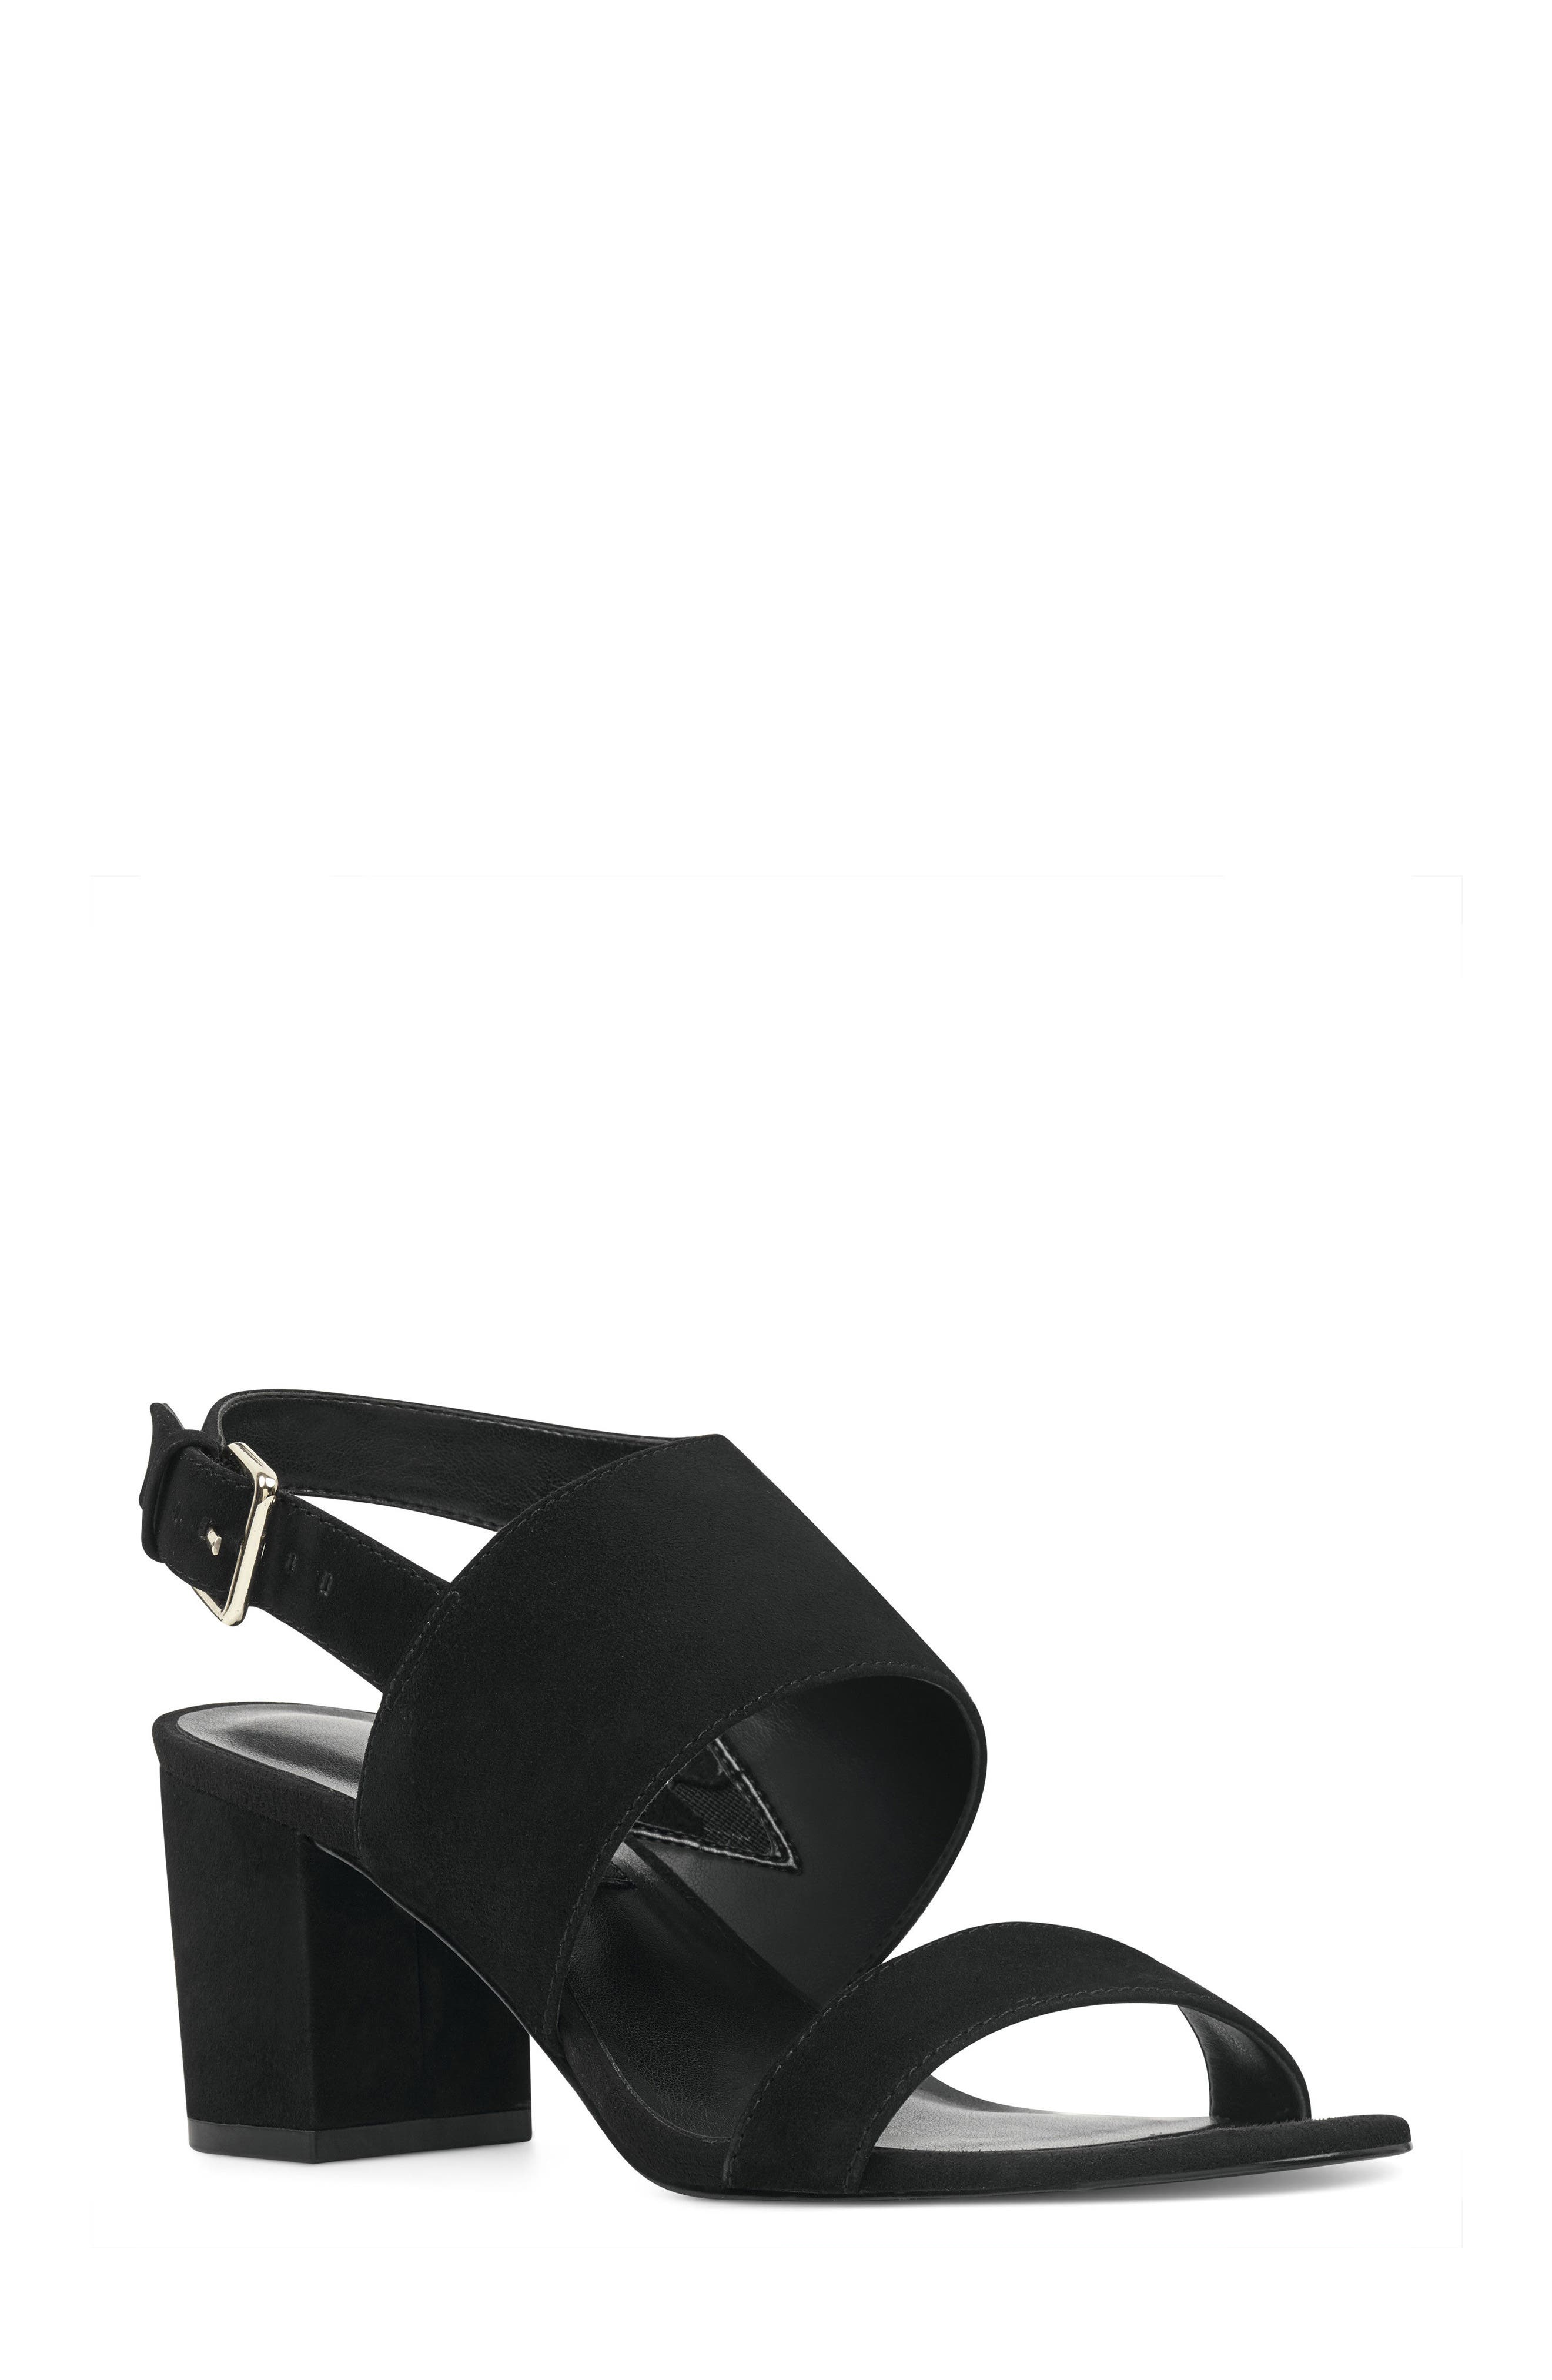 Forli Asymmetrical Sandal,                             Main thumbnail 1, color,                             001